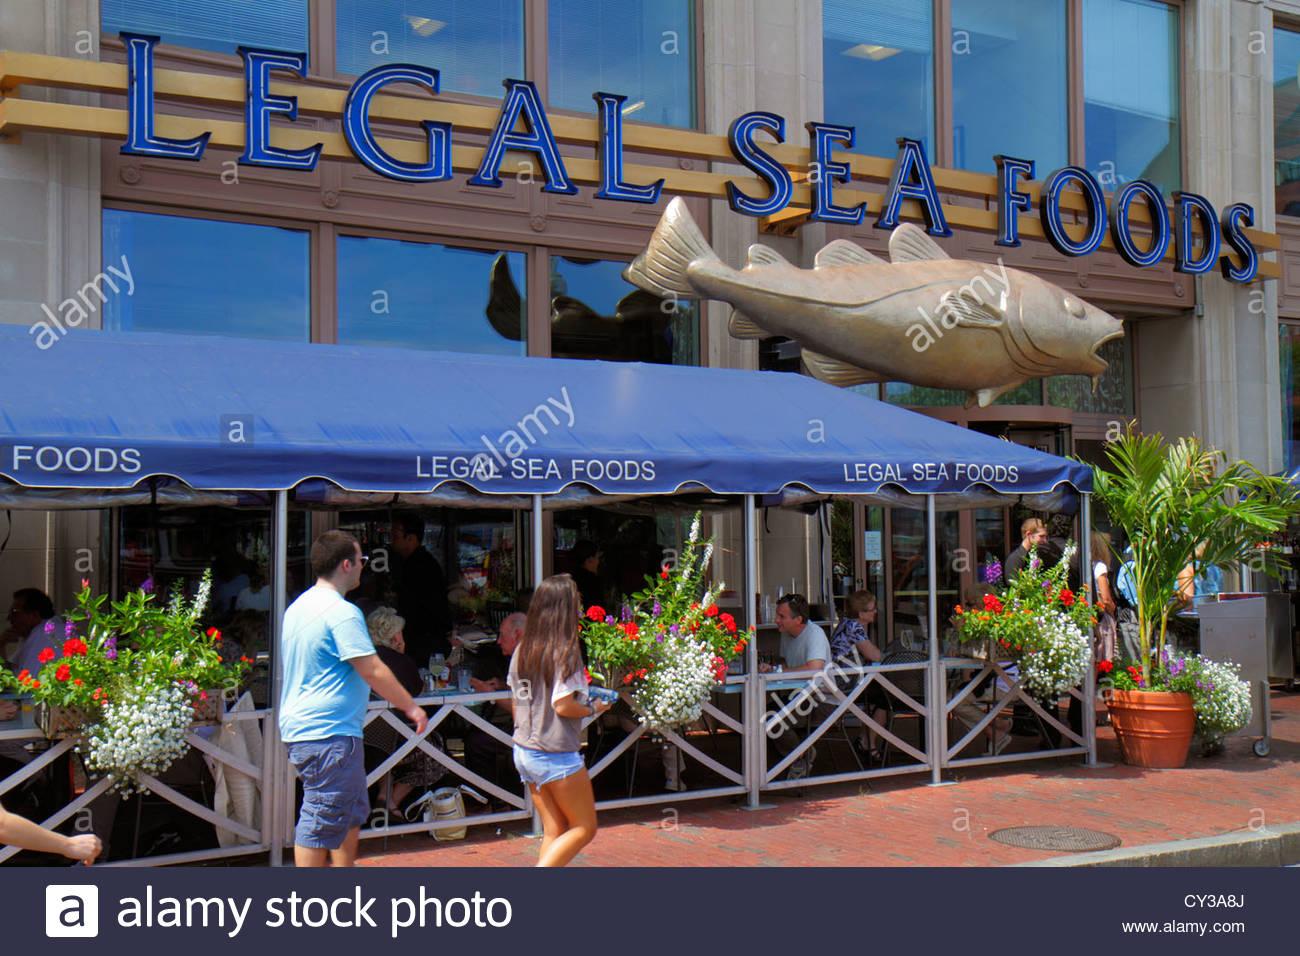 Boston Massachusetts Atlantic Avenue Legal Sea Foods restaurante mariscos entrada frontal para comer al aire libre Imagen De Stock